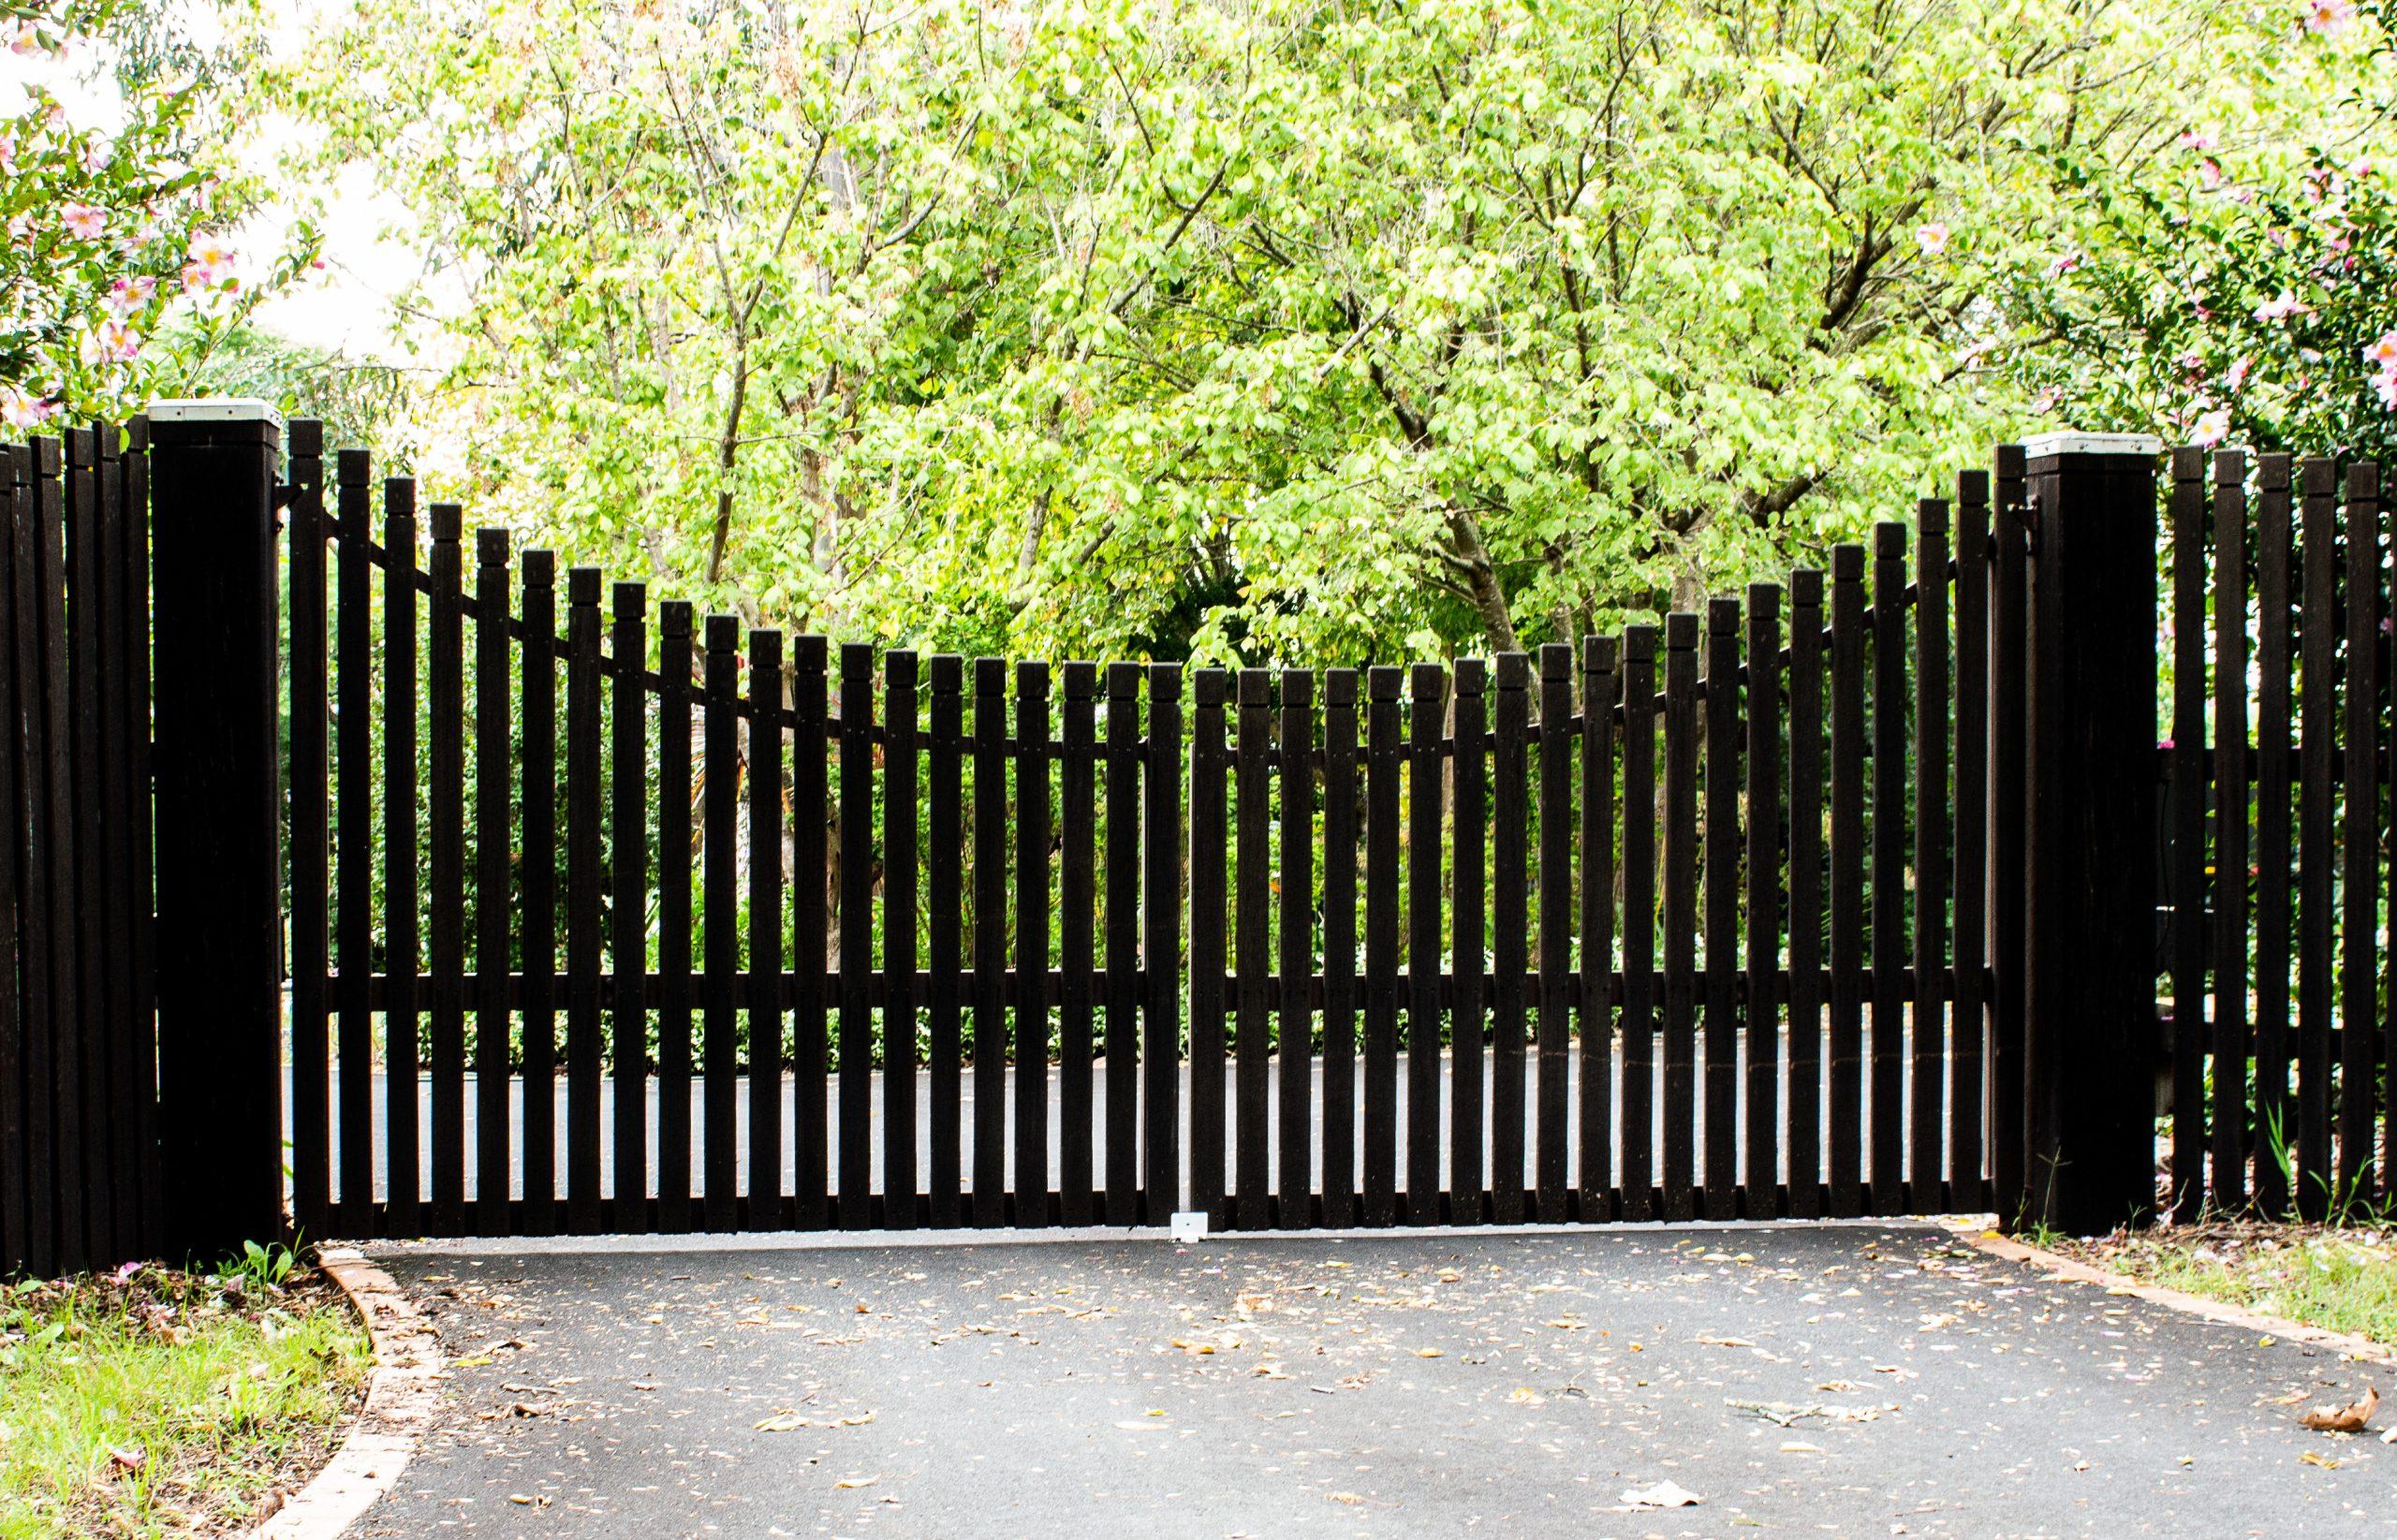 little rock arkansas professional gate installer installation install build builder north little rock fence contractor fences fencing gates